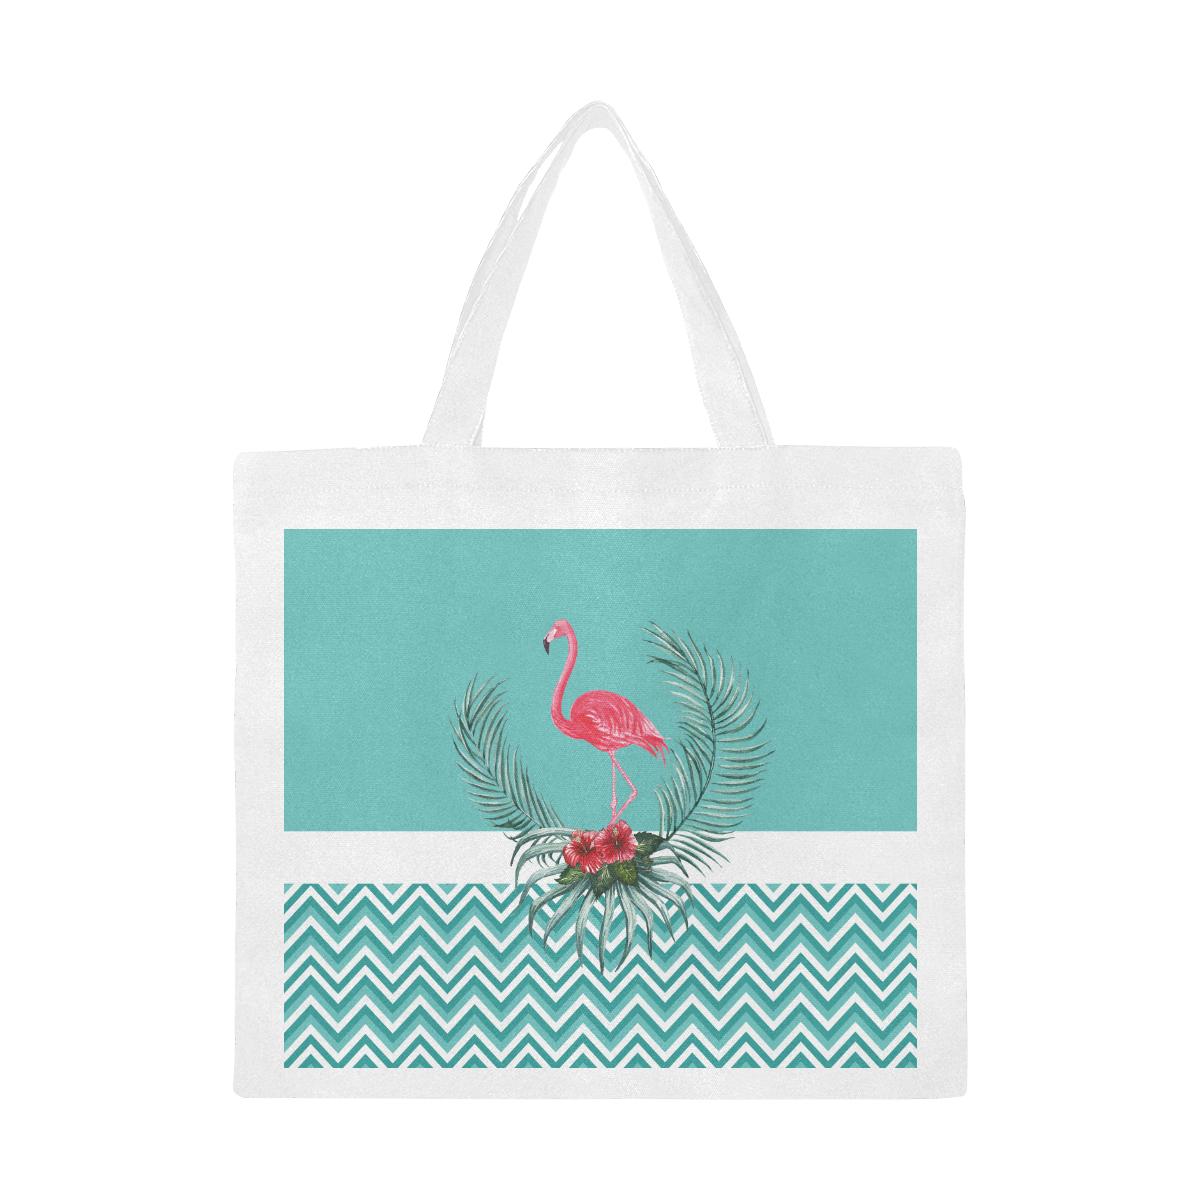 Retro Flamingo Chevron Canvas Tote Bag/Large (Model 1702)